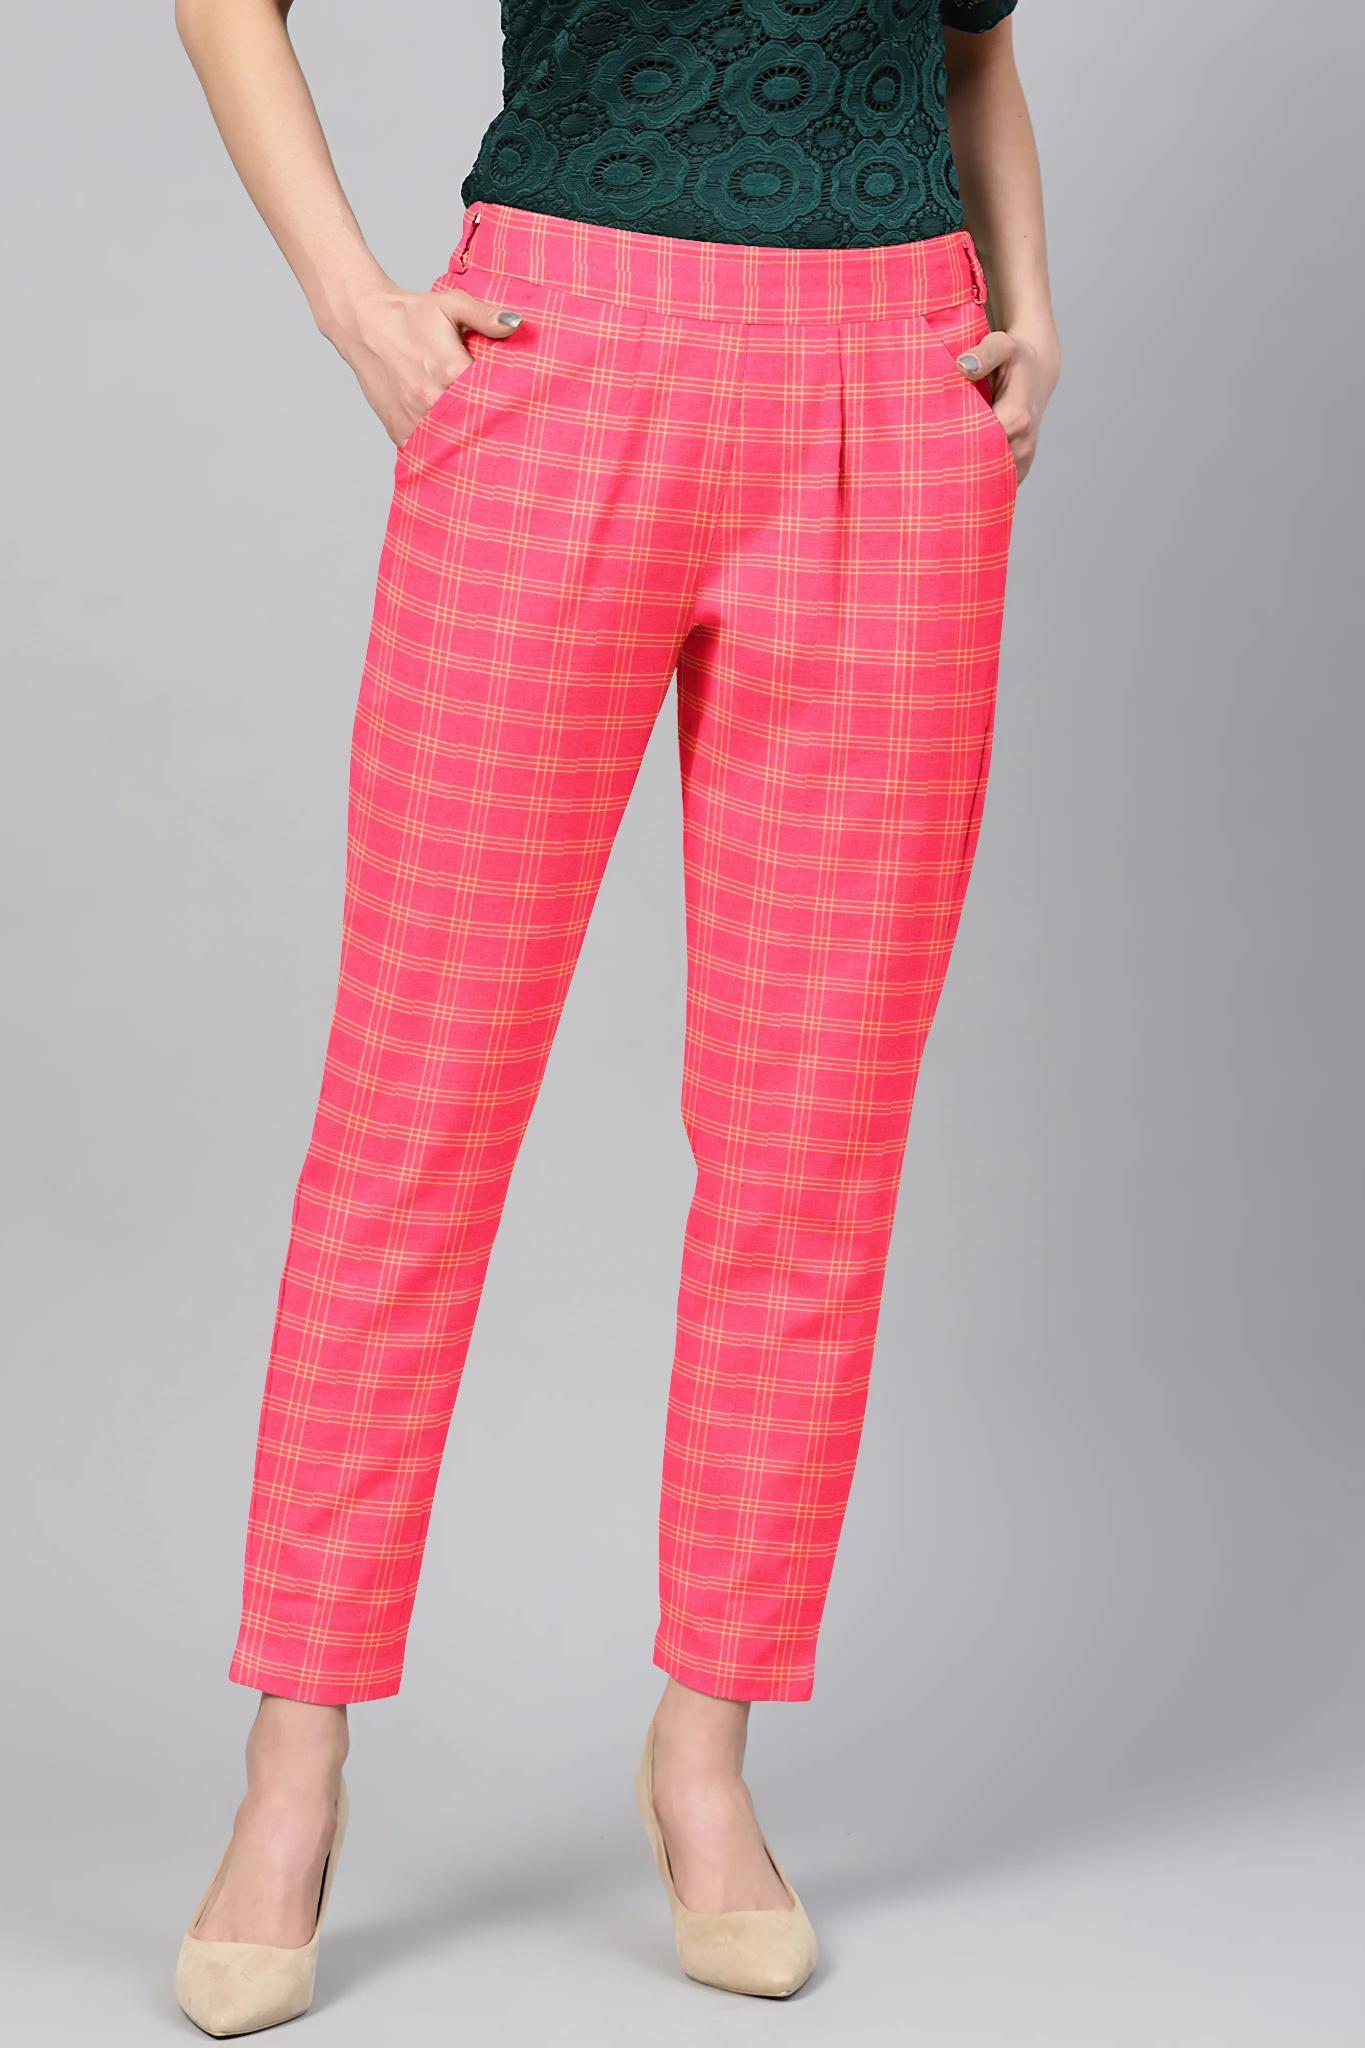 /home/customer/www/fabartcraft.com/public_html/uploadshttps://www.shopolics.com/uploads/images/medium/Pink-Cream-Cotton-Check-Regular-Fit-Solid-Trouser-36113.jpg